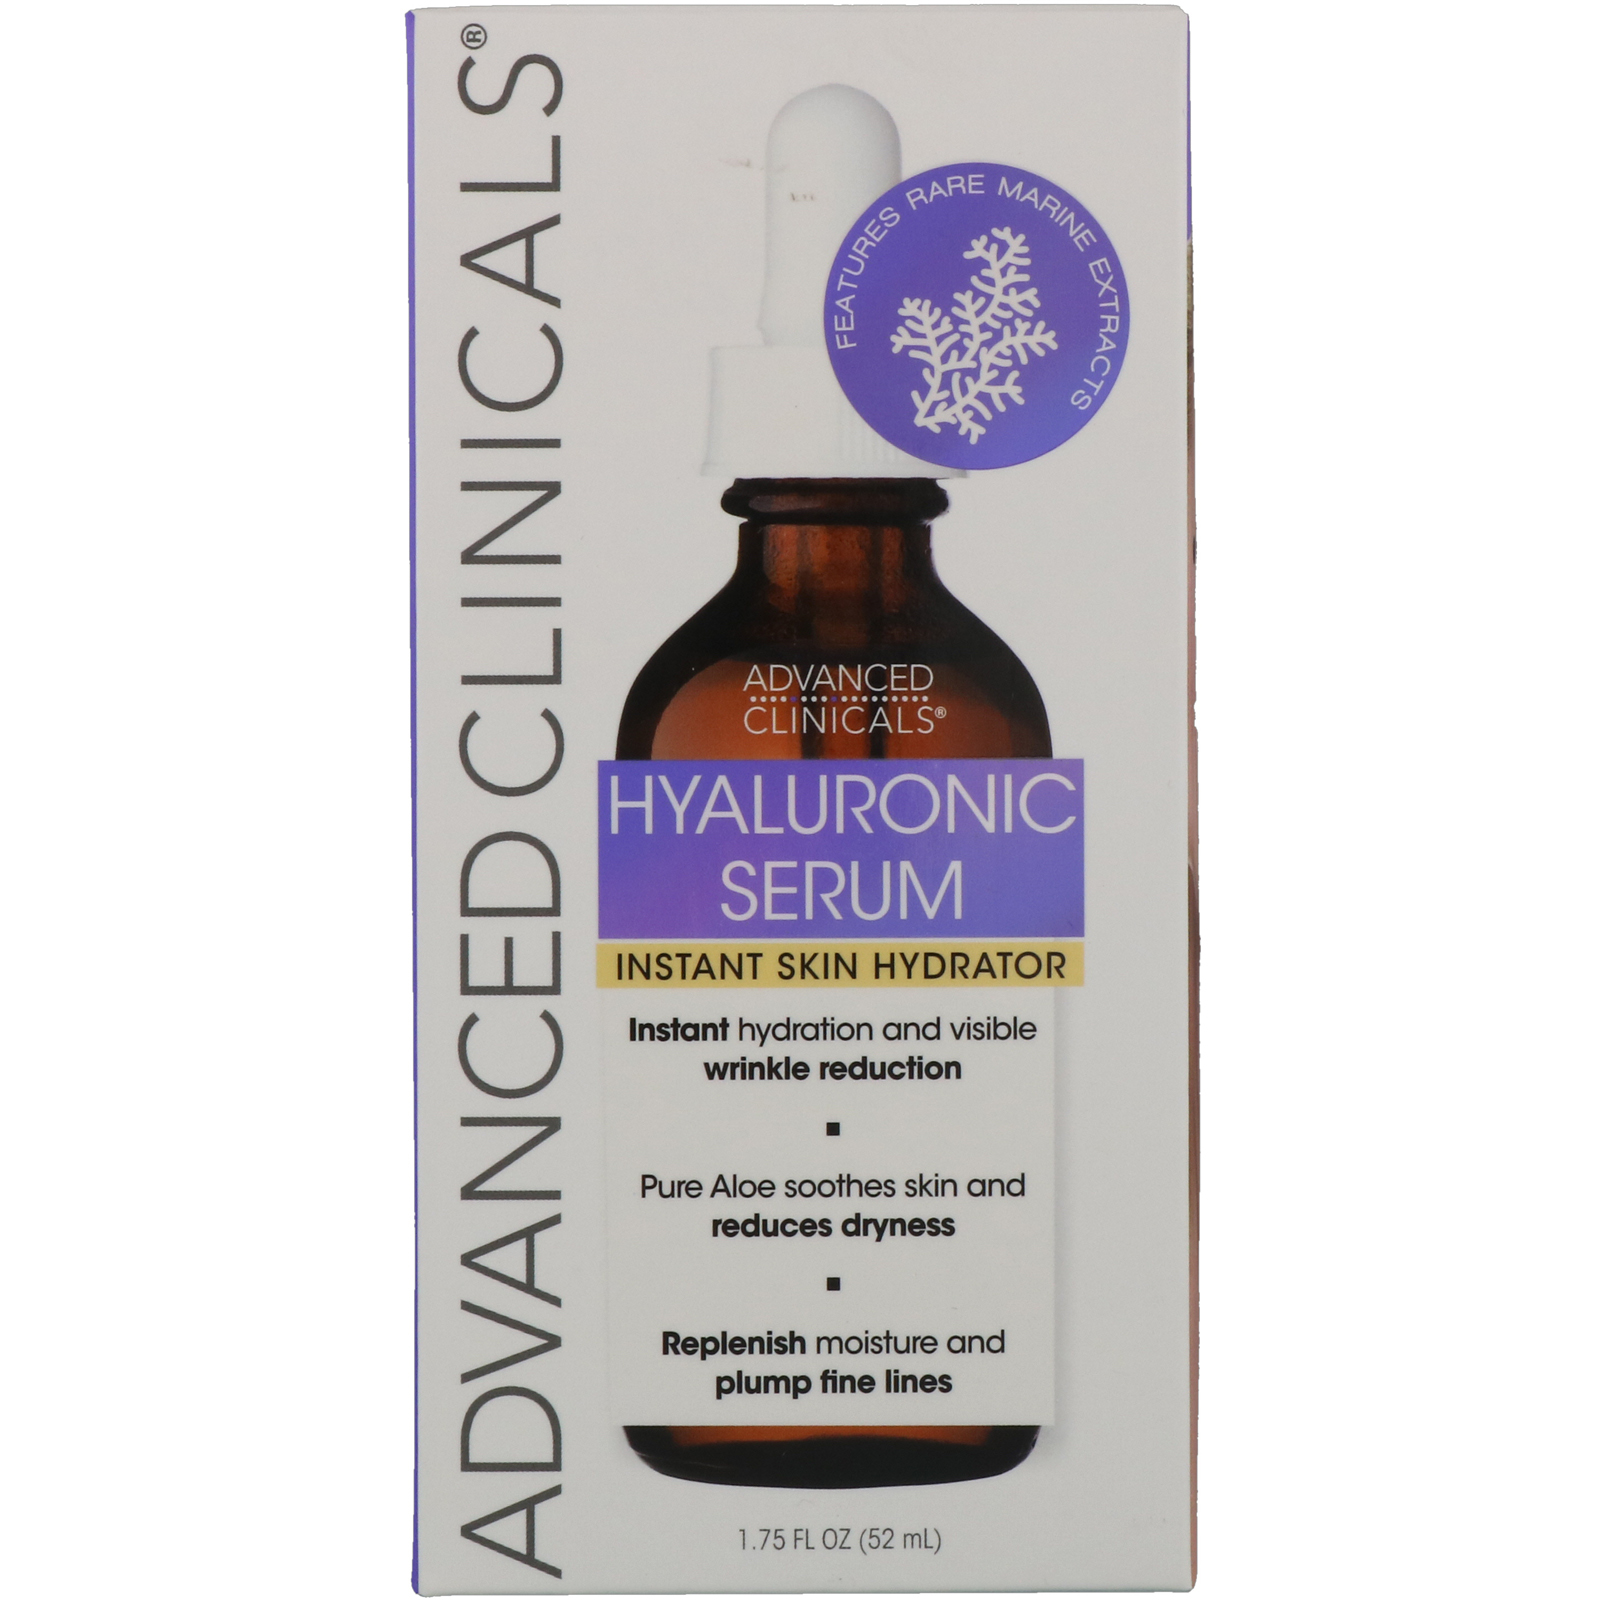 Advanced Clinicals, Hyaluronic Serum, Instant Skin Hydrator, 1 75 fl oz (52  ml)